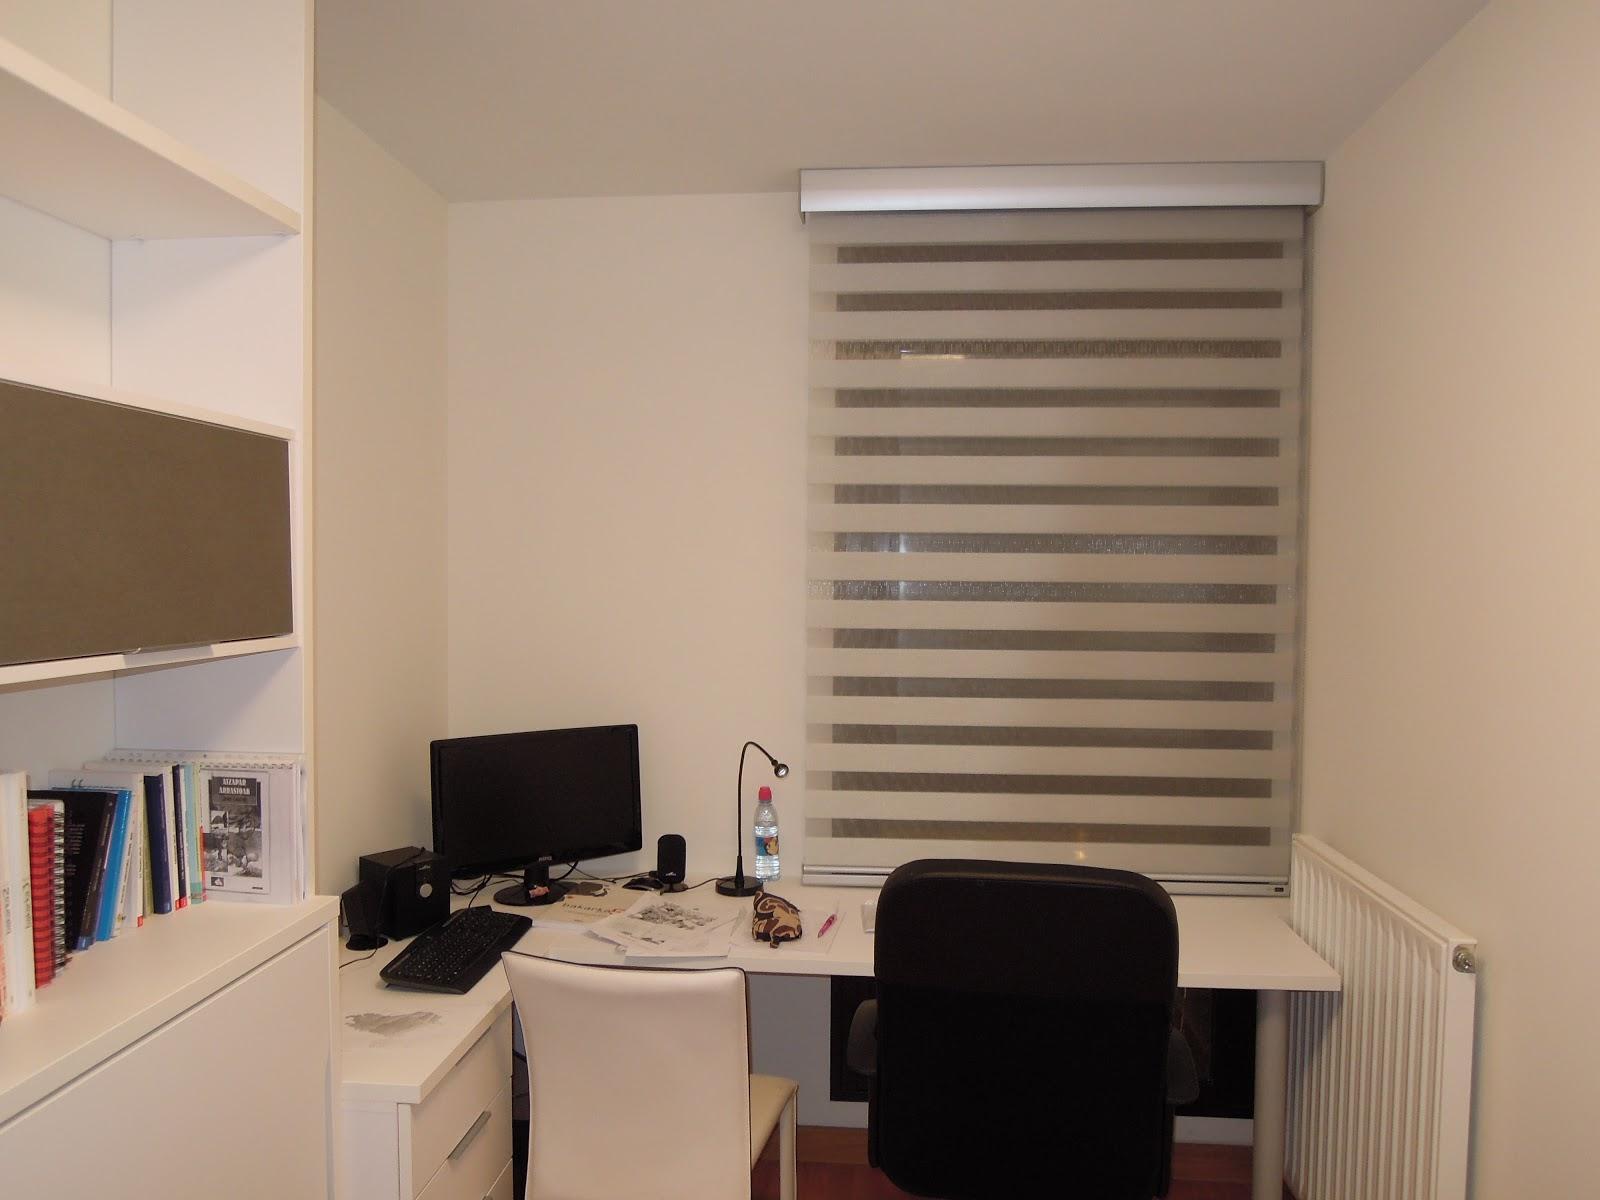 Fotos de cortinas dormitorio juvenil 2012 for Cortinas dormitorio modernas